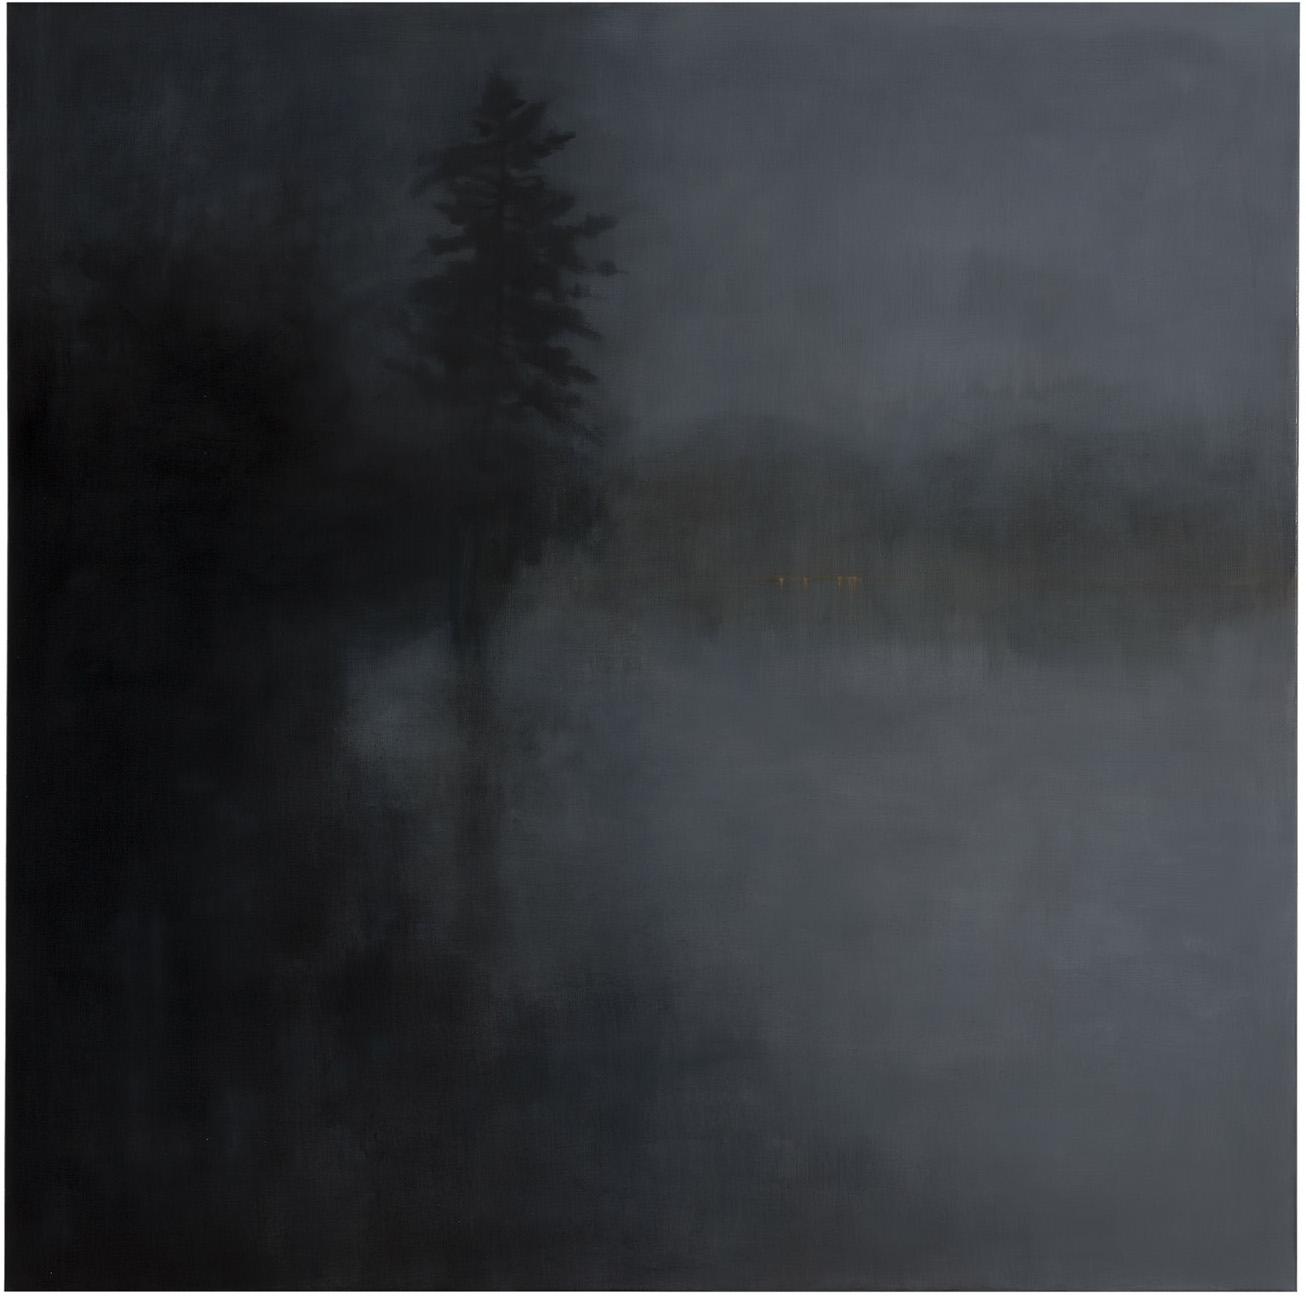 Night Light oil and wax on linen 152 x 152 cm